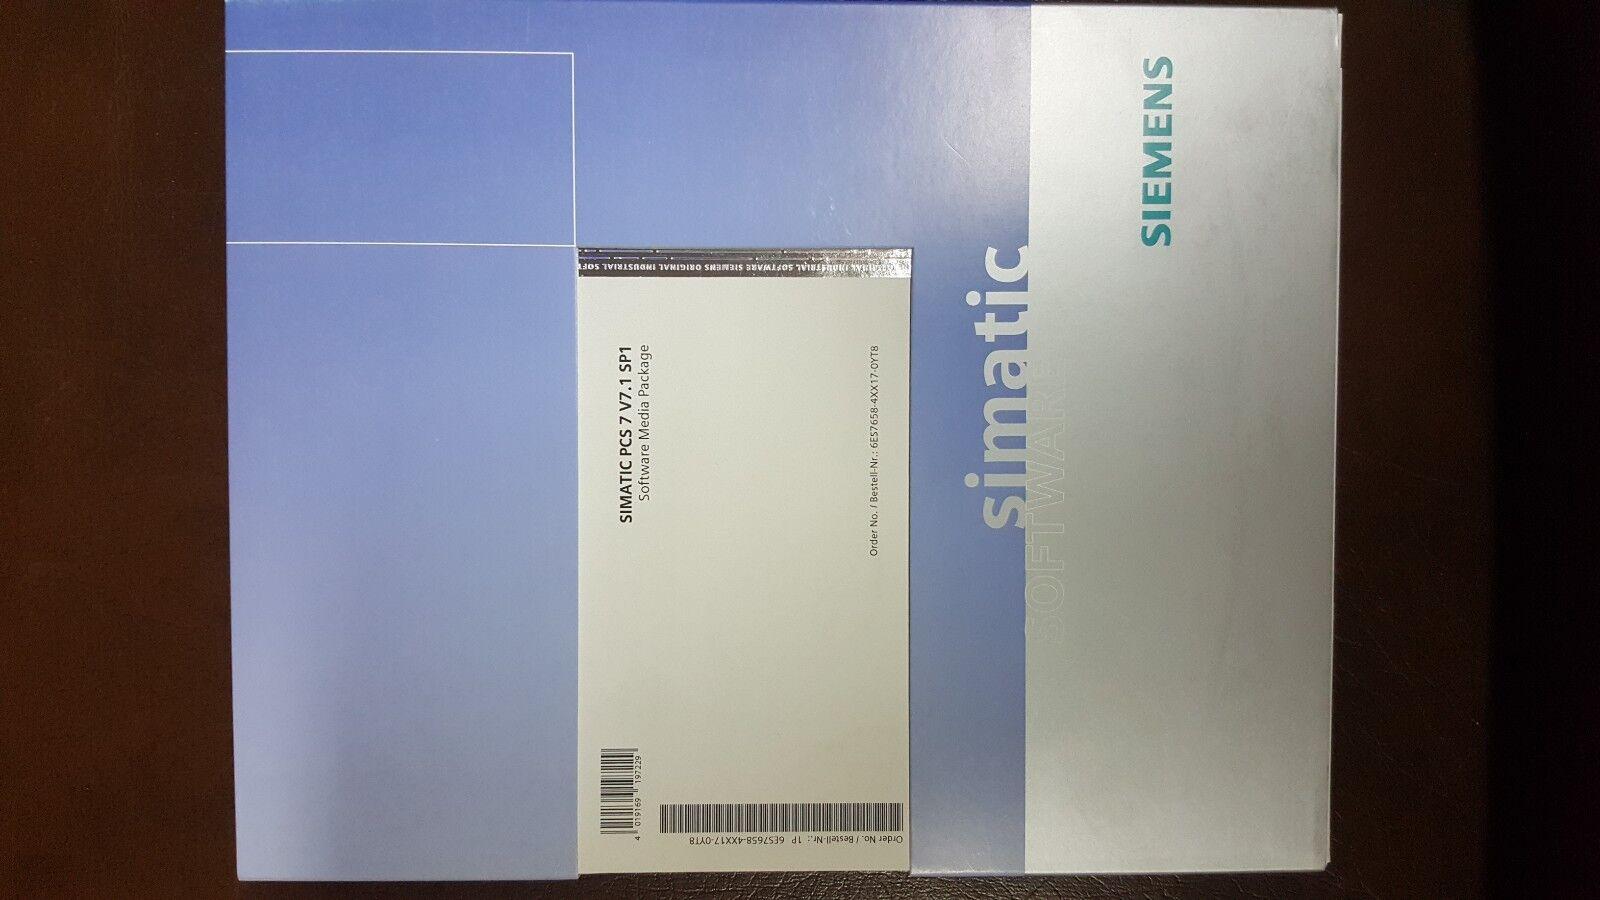 Simatic Pc 7 paquete de medios de software de de de software, V7.1 6ES7658-4XX17-0YT8 1872da